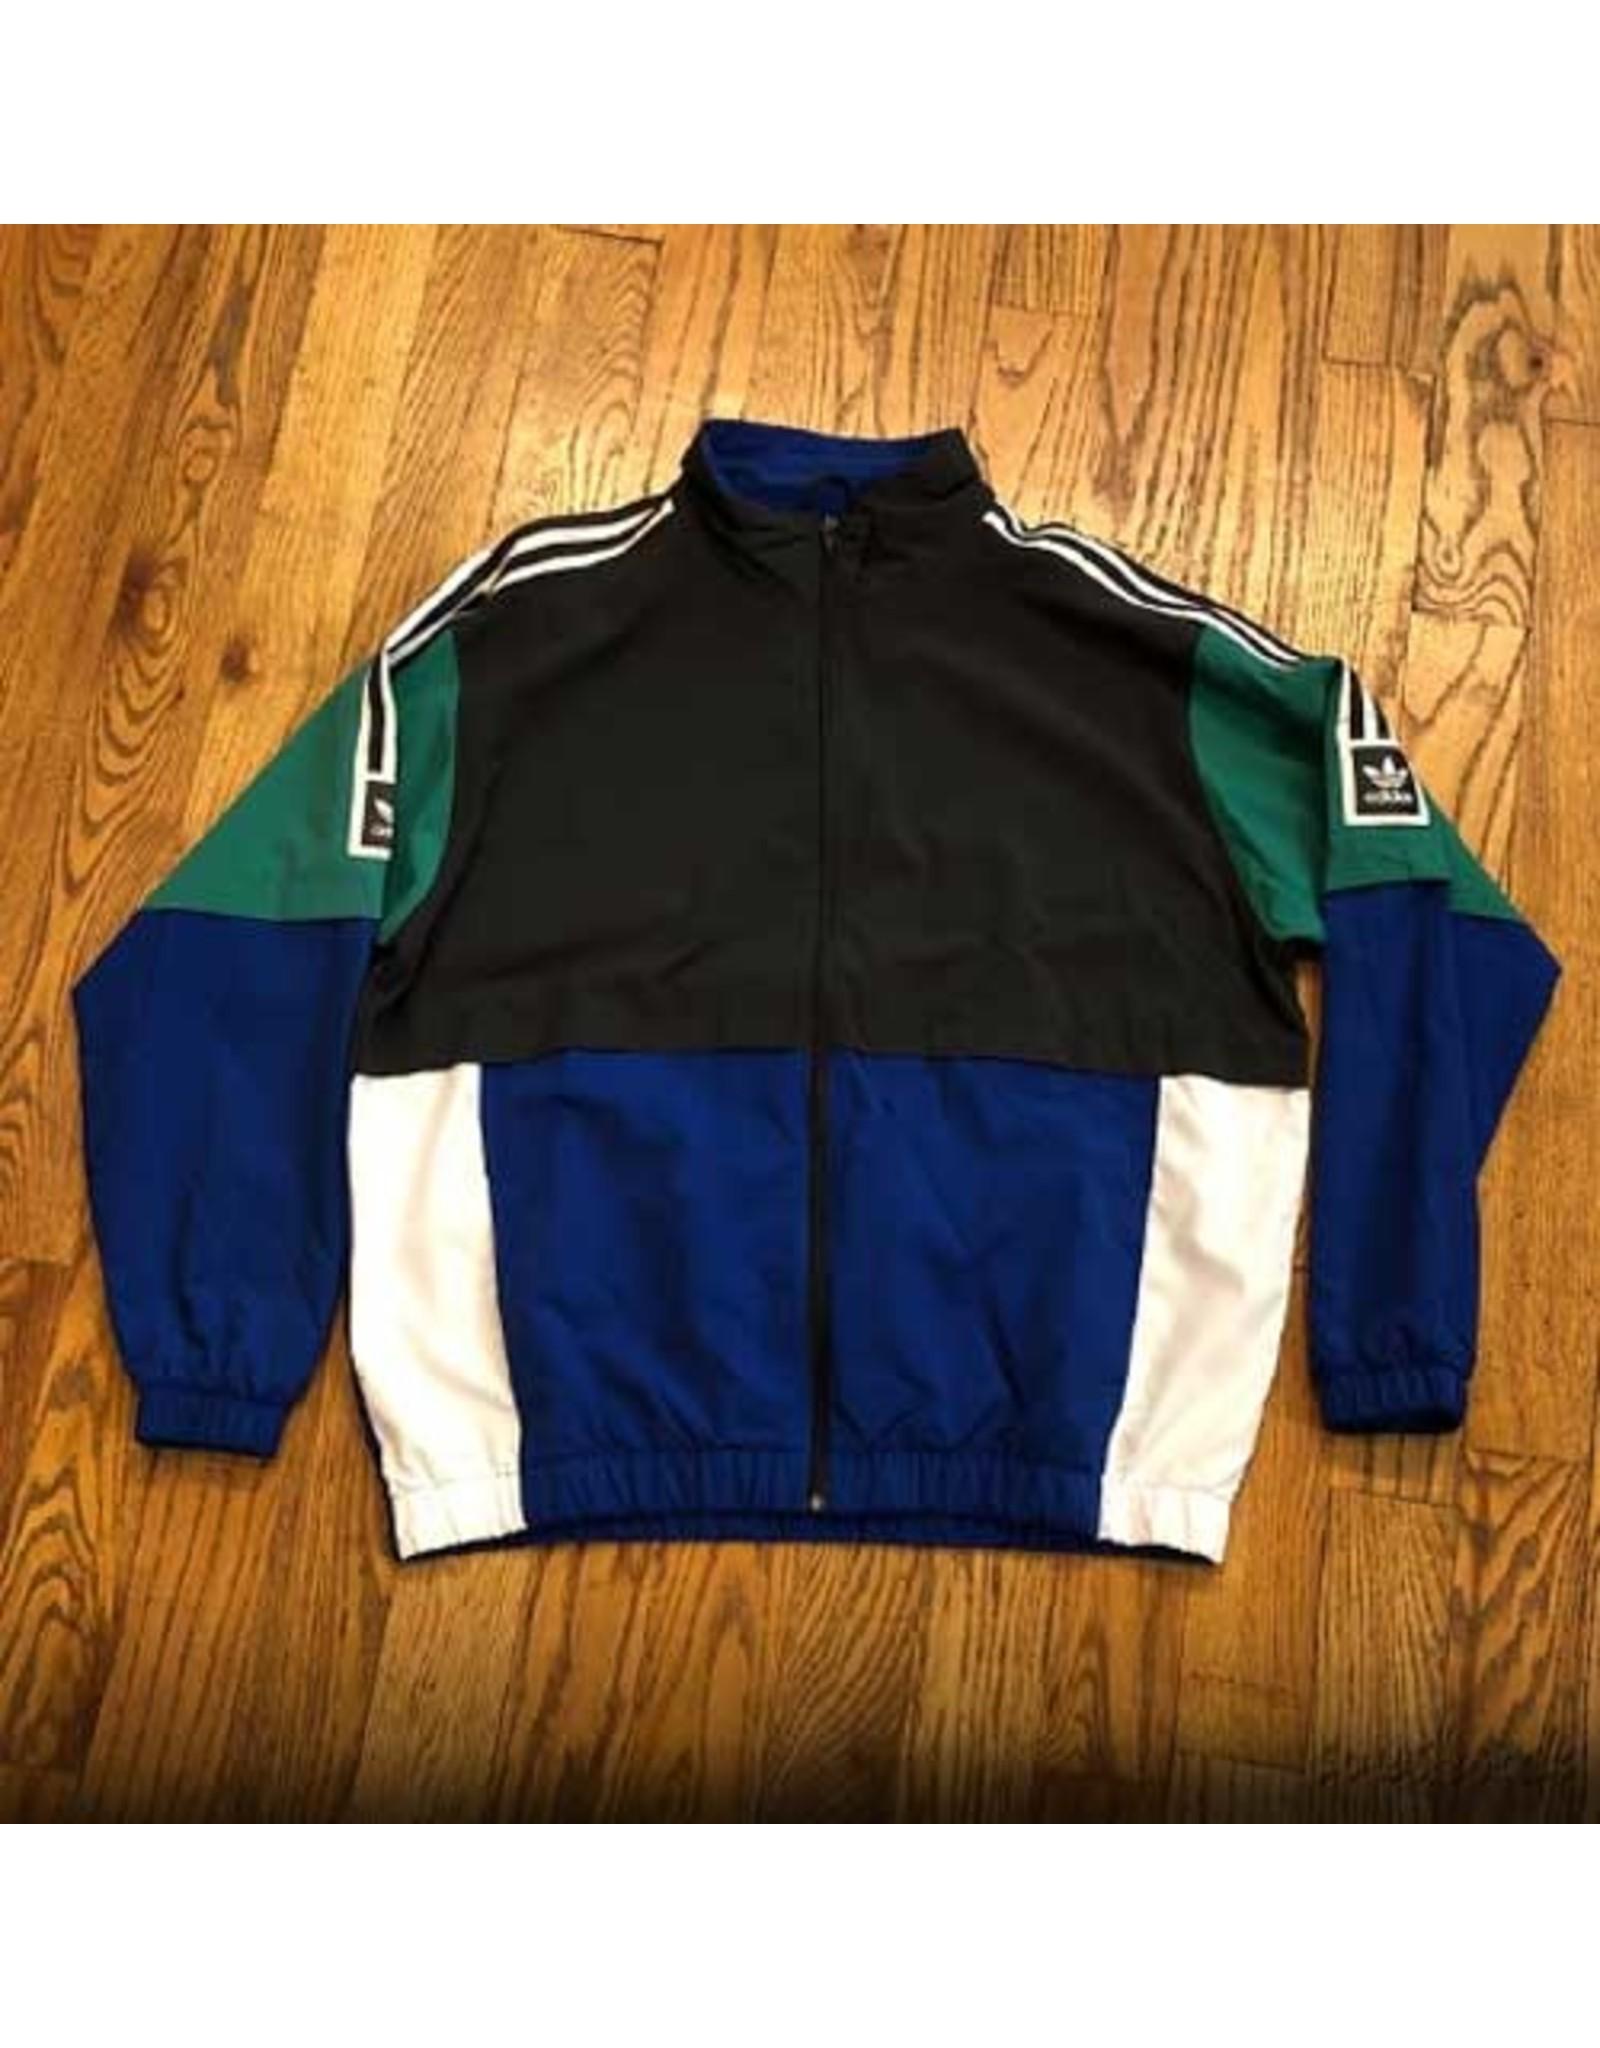 ADIDAS Adidas Jacket 20 Jacket Multi